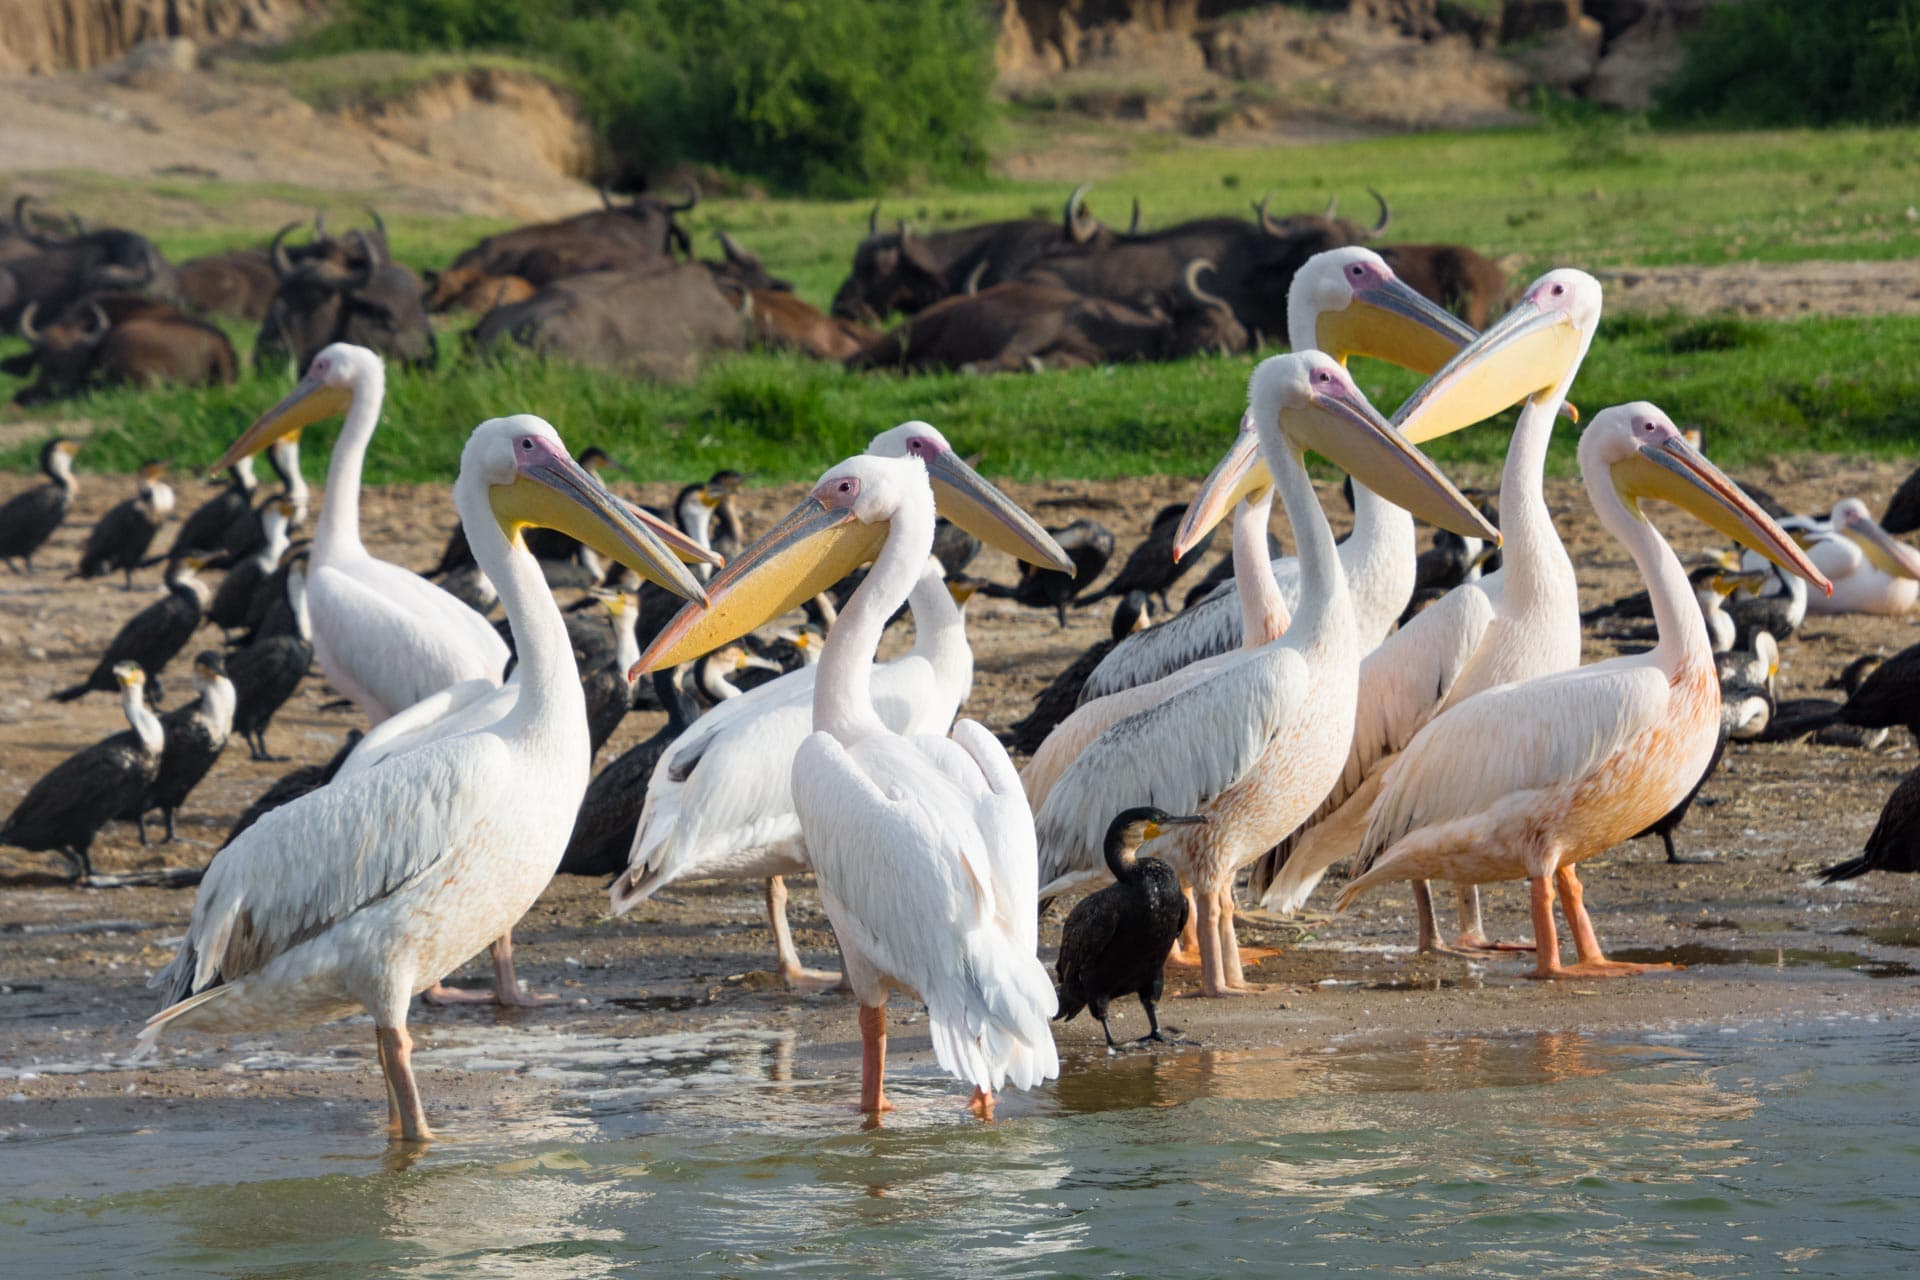 Queen Elisabeth Nationalpark in Uganda